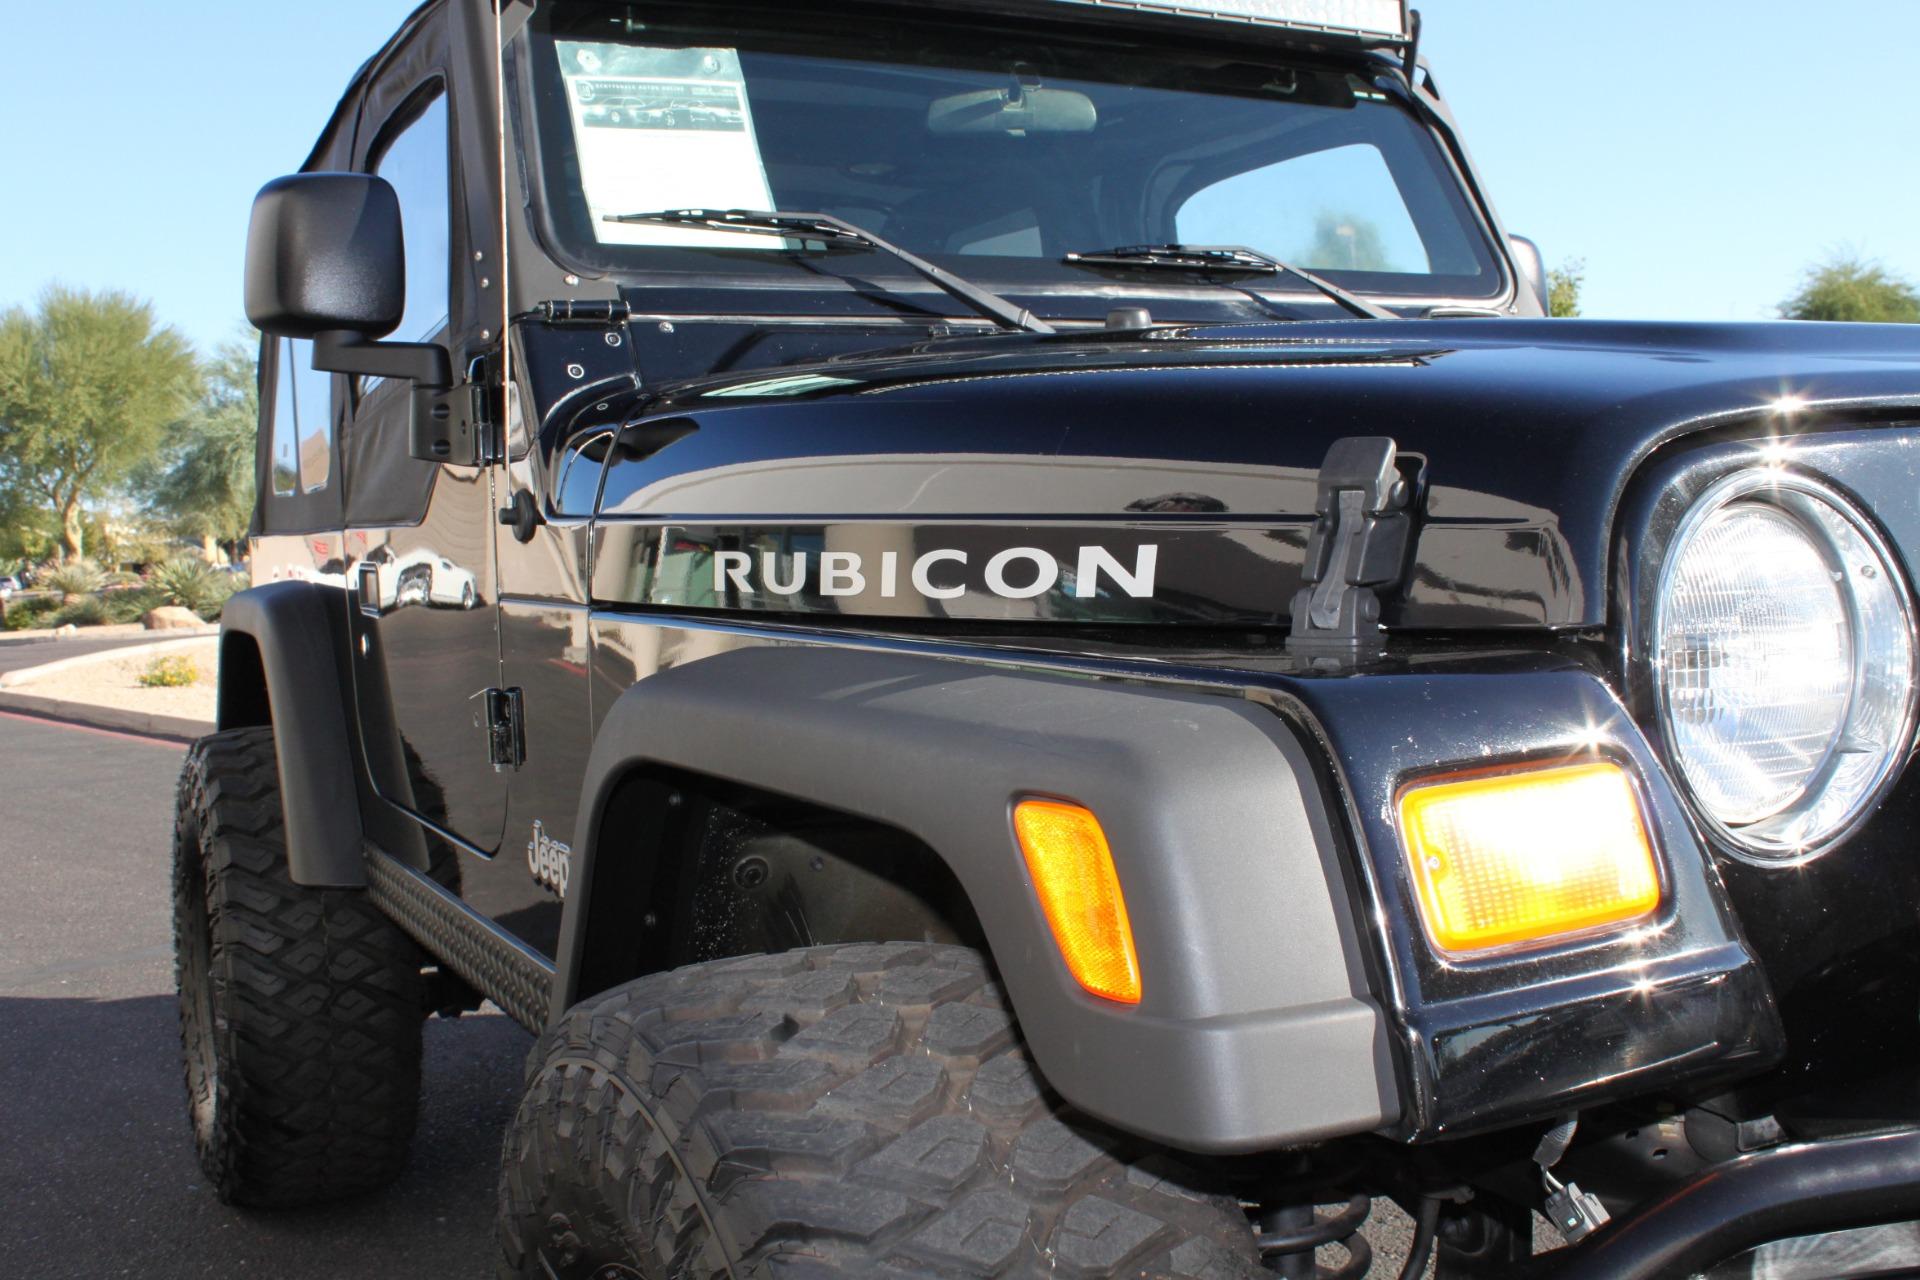 Used-2004-Jeep-Wrangler-Rubicon-Alfa-Romeo